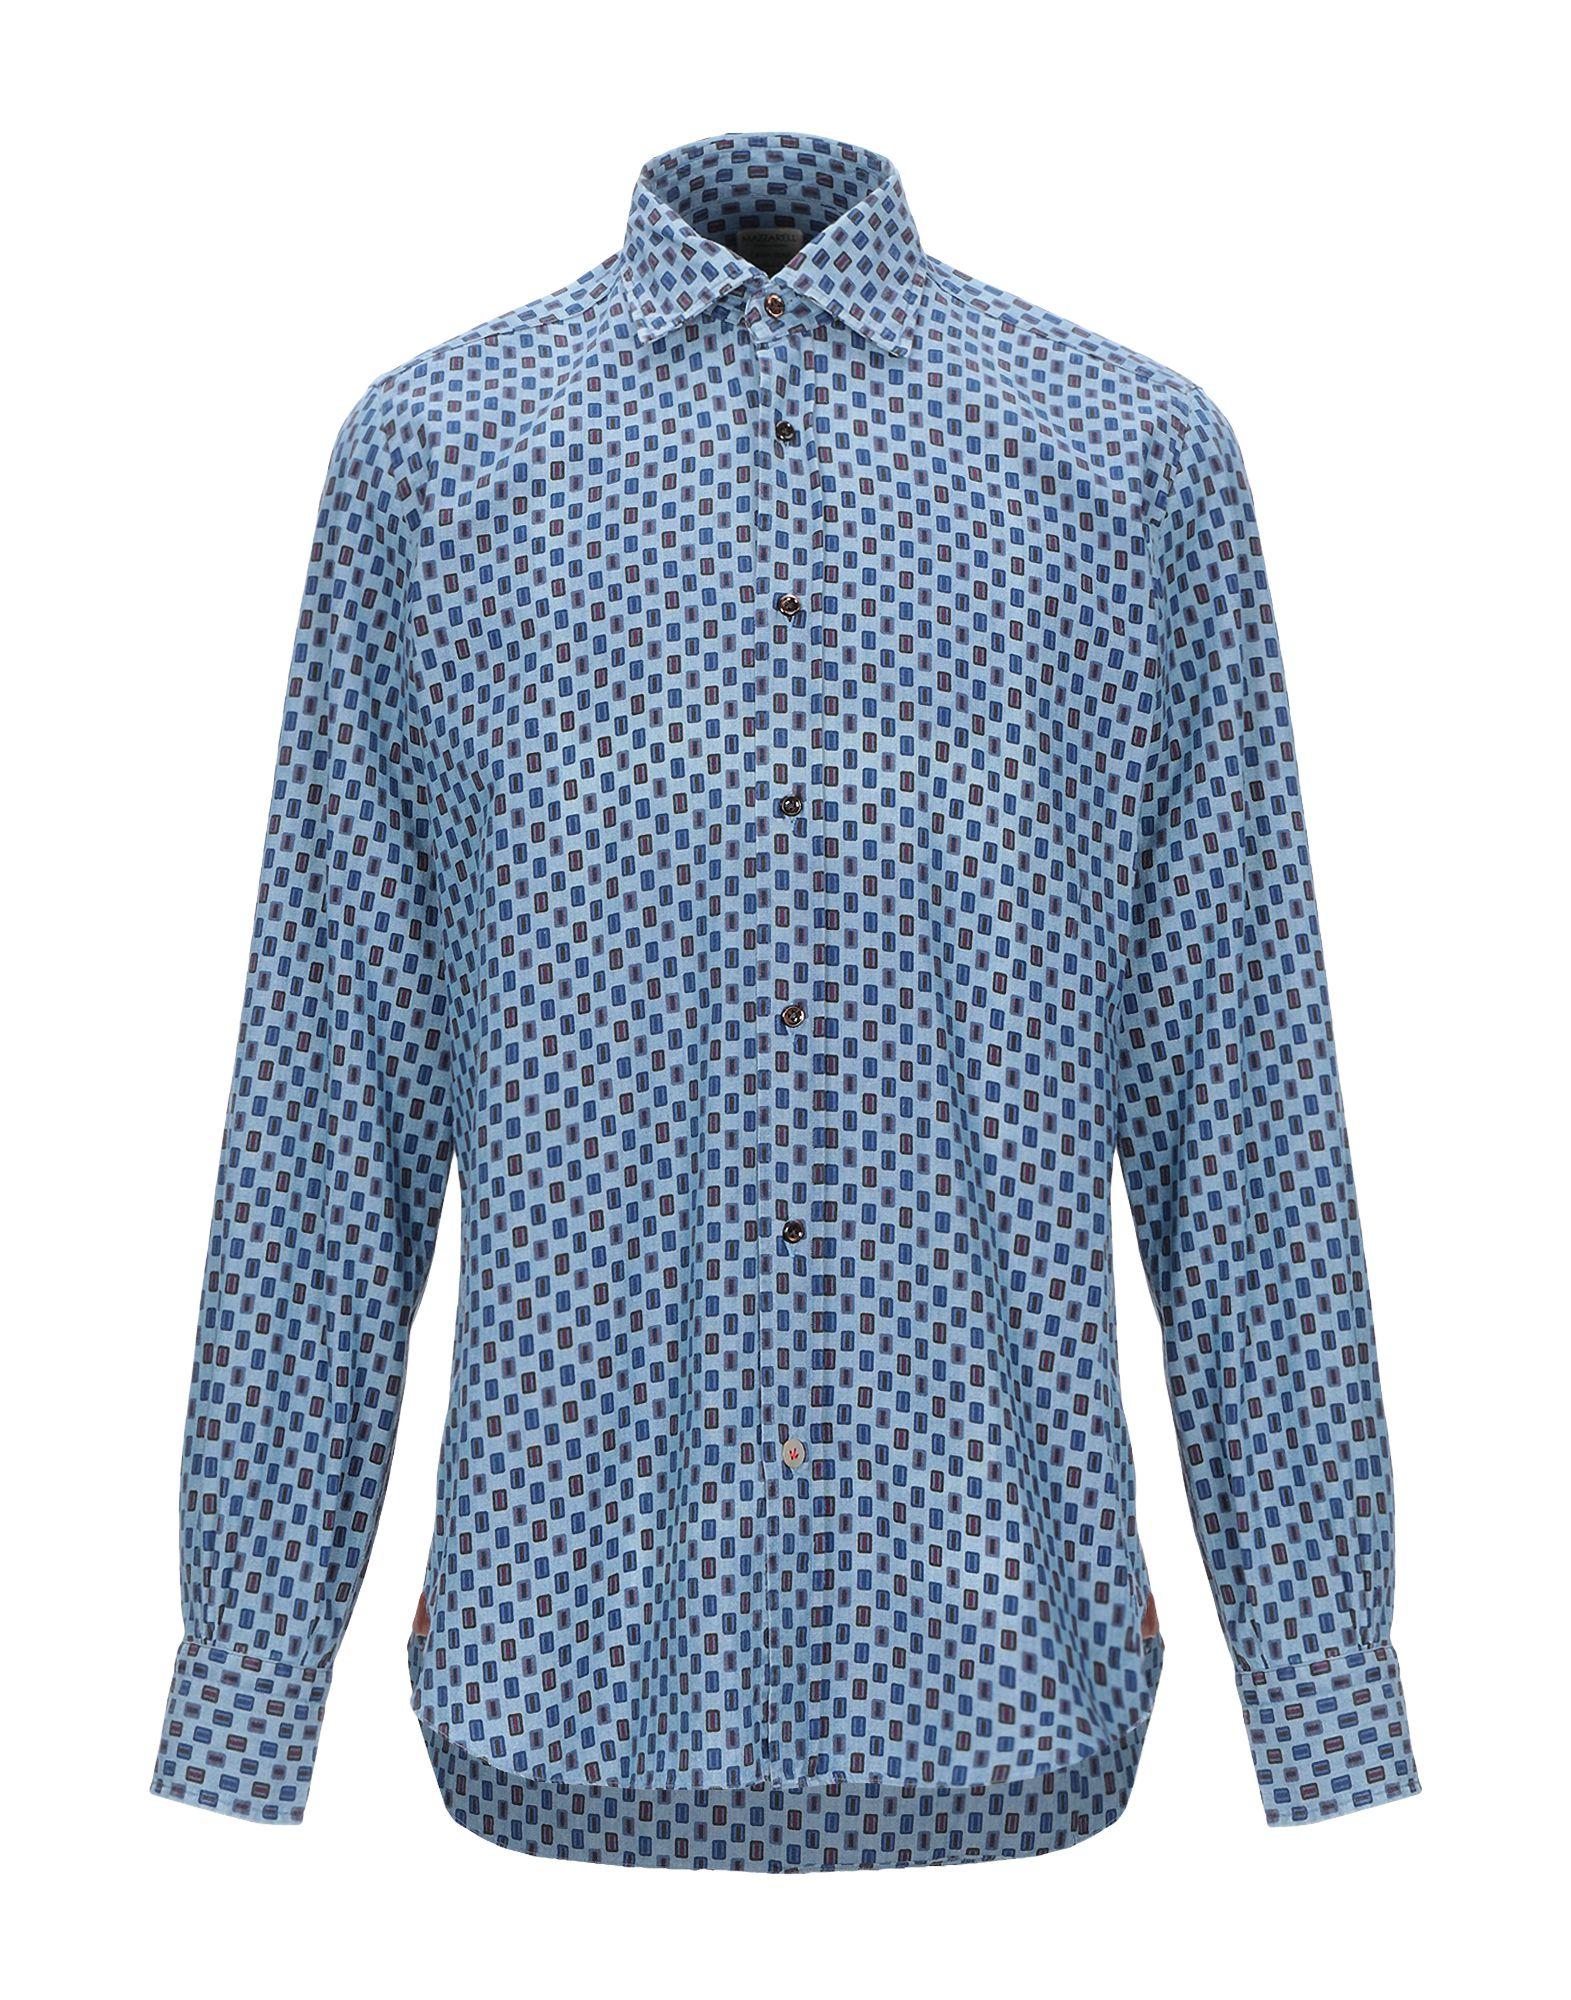 Camicia Fantasia Mazzarelli Mazzarelli uomo - 38851308PO  günstigster Preis